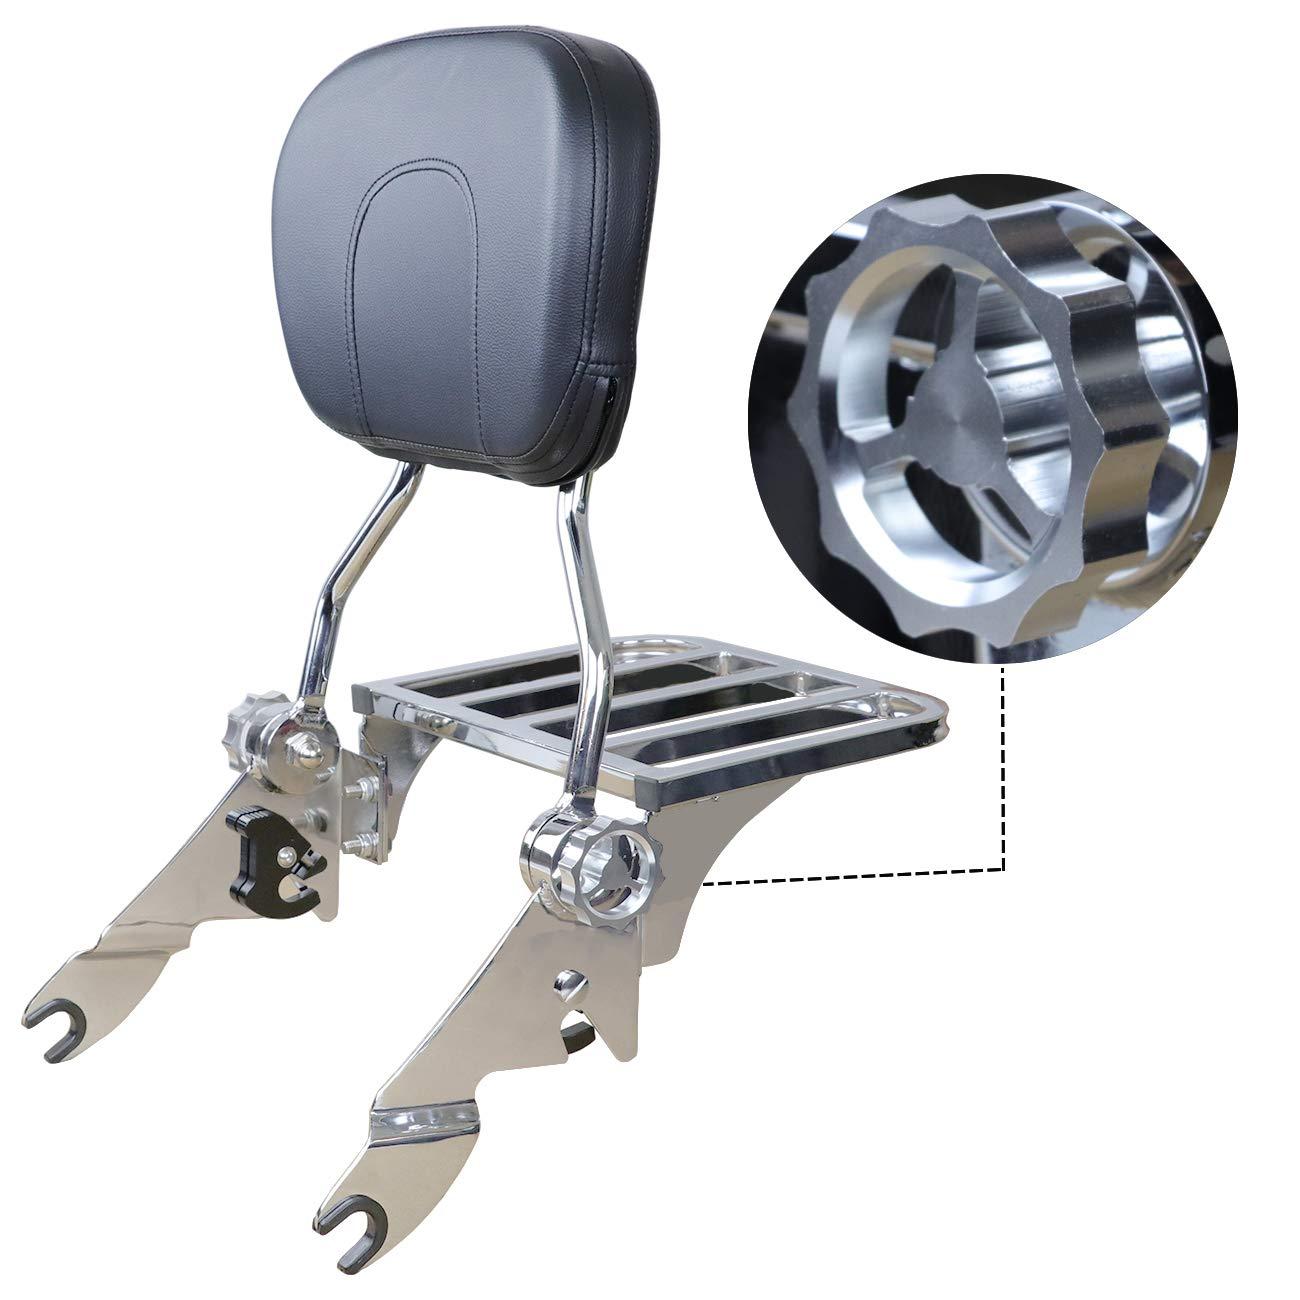 AUFER Adjustable Detachable Backrest Sissy Bar Upright Passenger Backrest w//Pad With luggage rack For Touring Road King Street Glide FLHR FLHX FLHT FLTR 2009-2020 (Black)